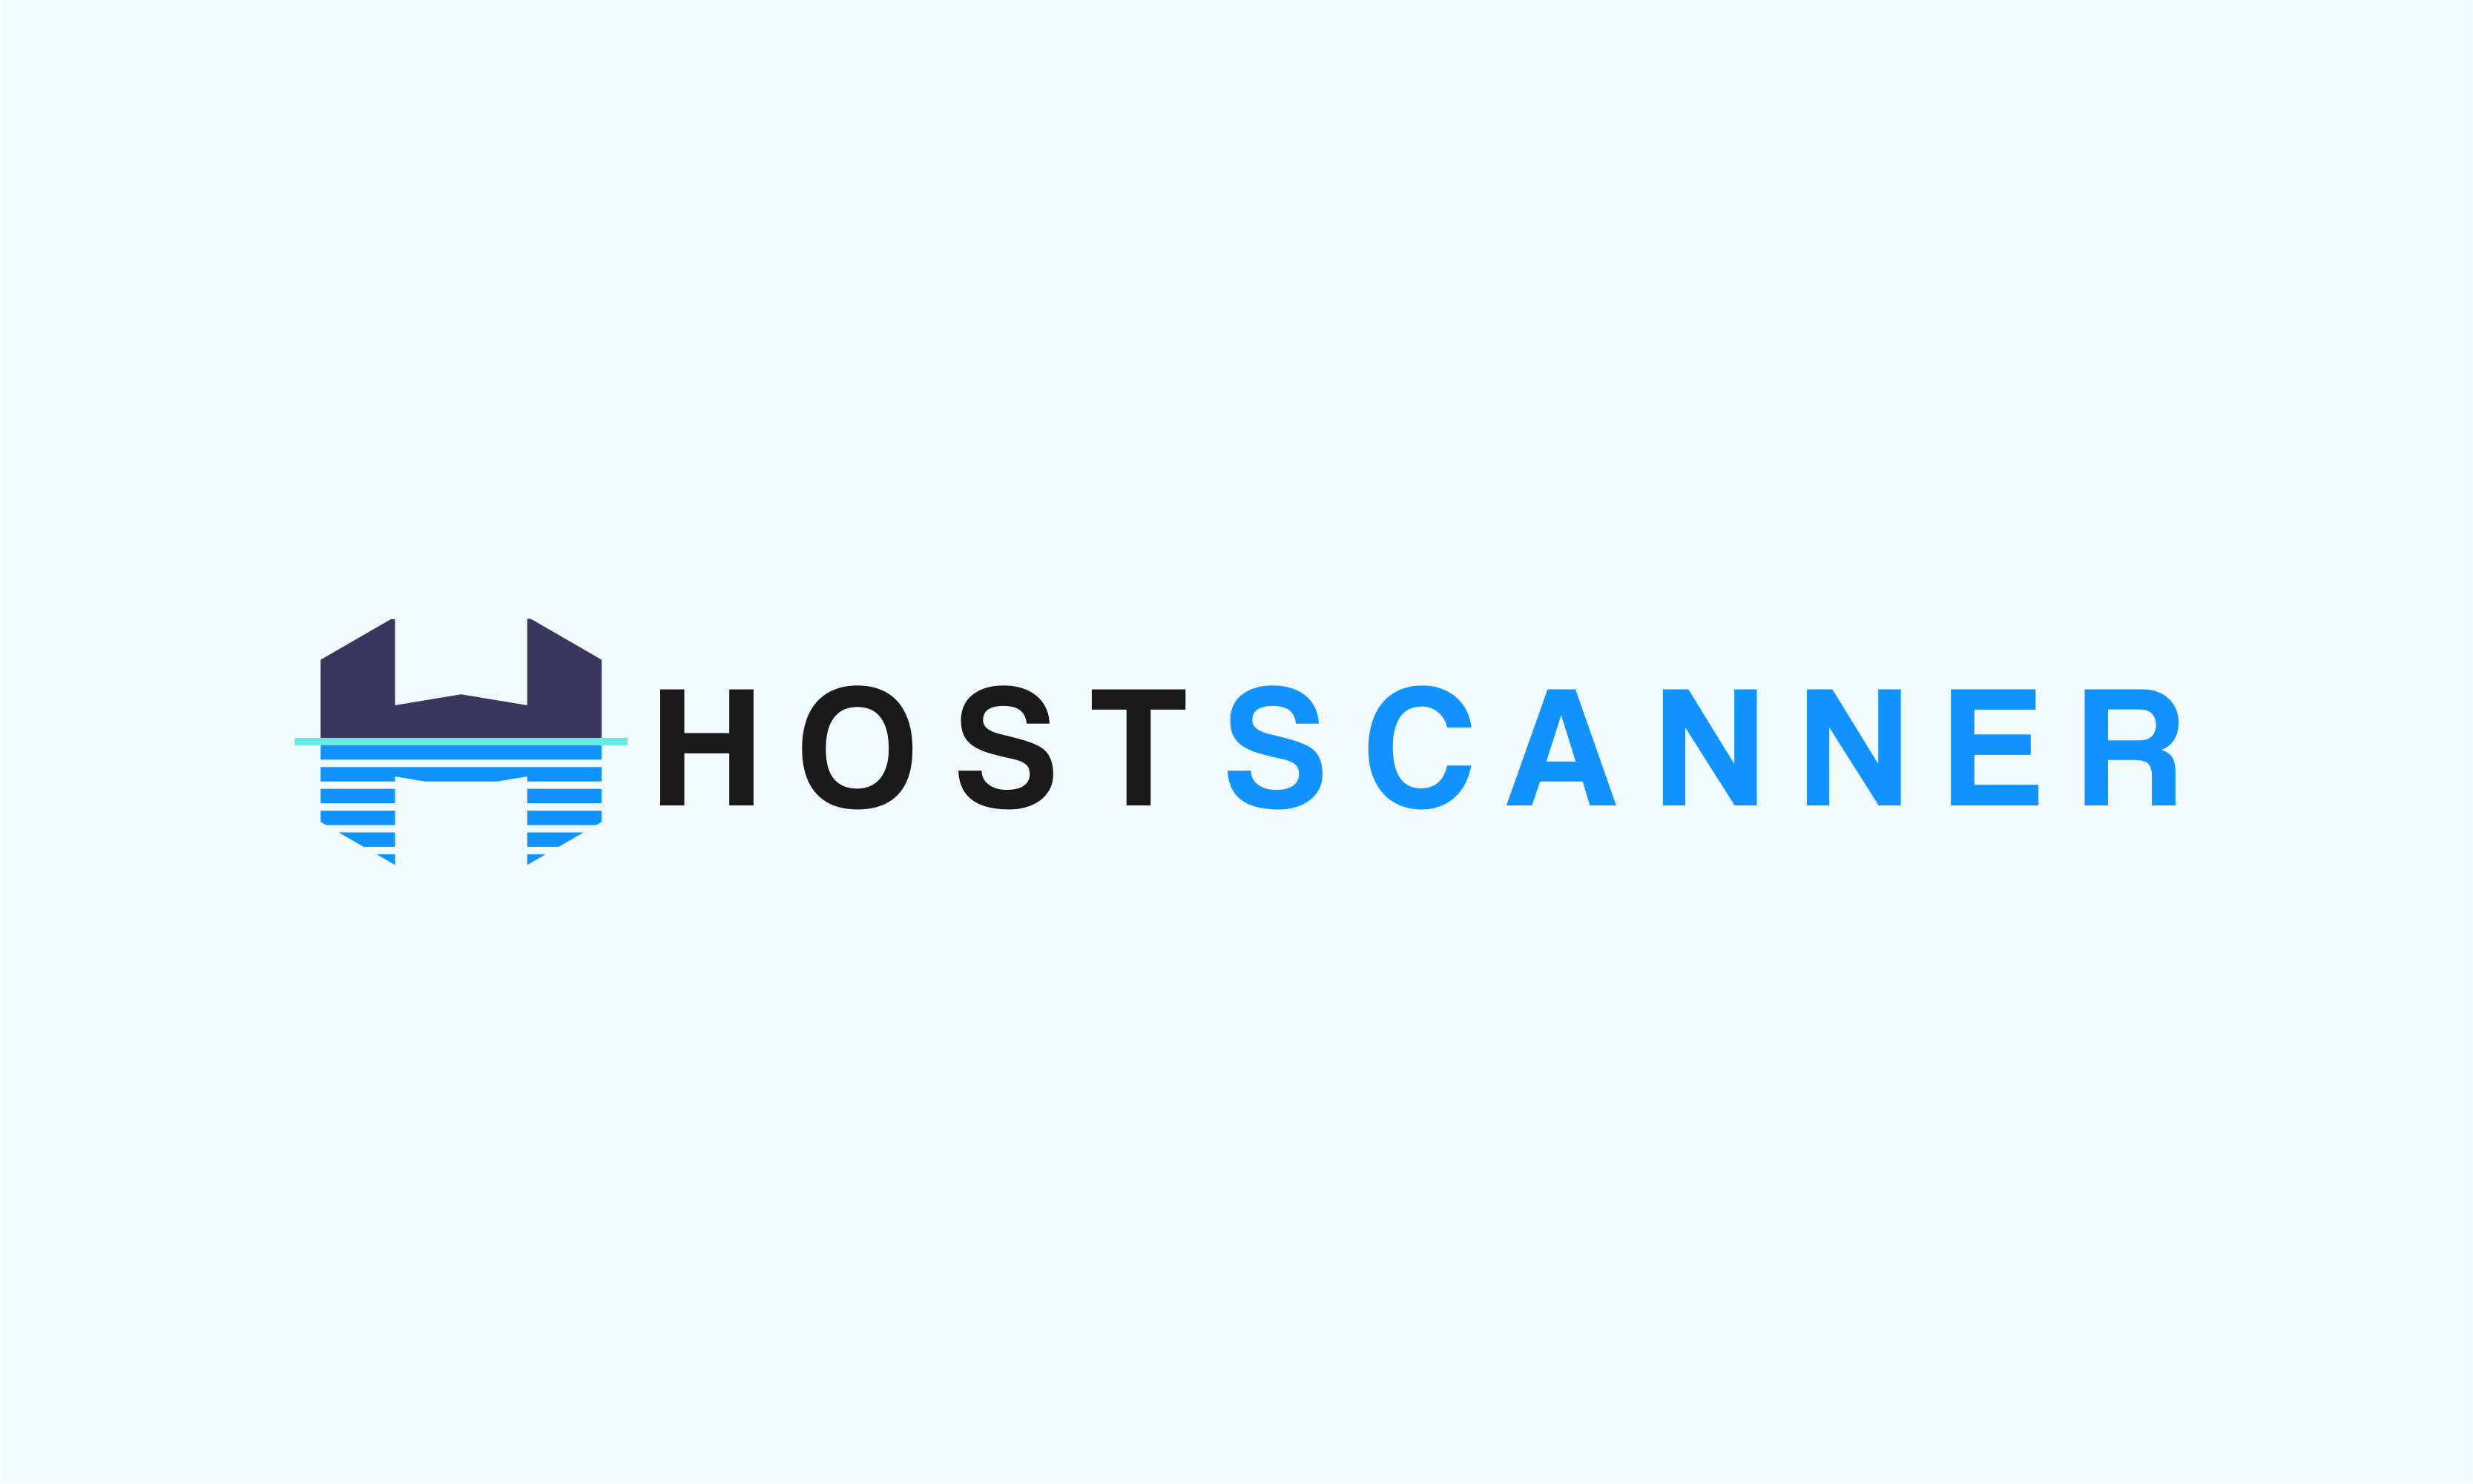 Hostscanner